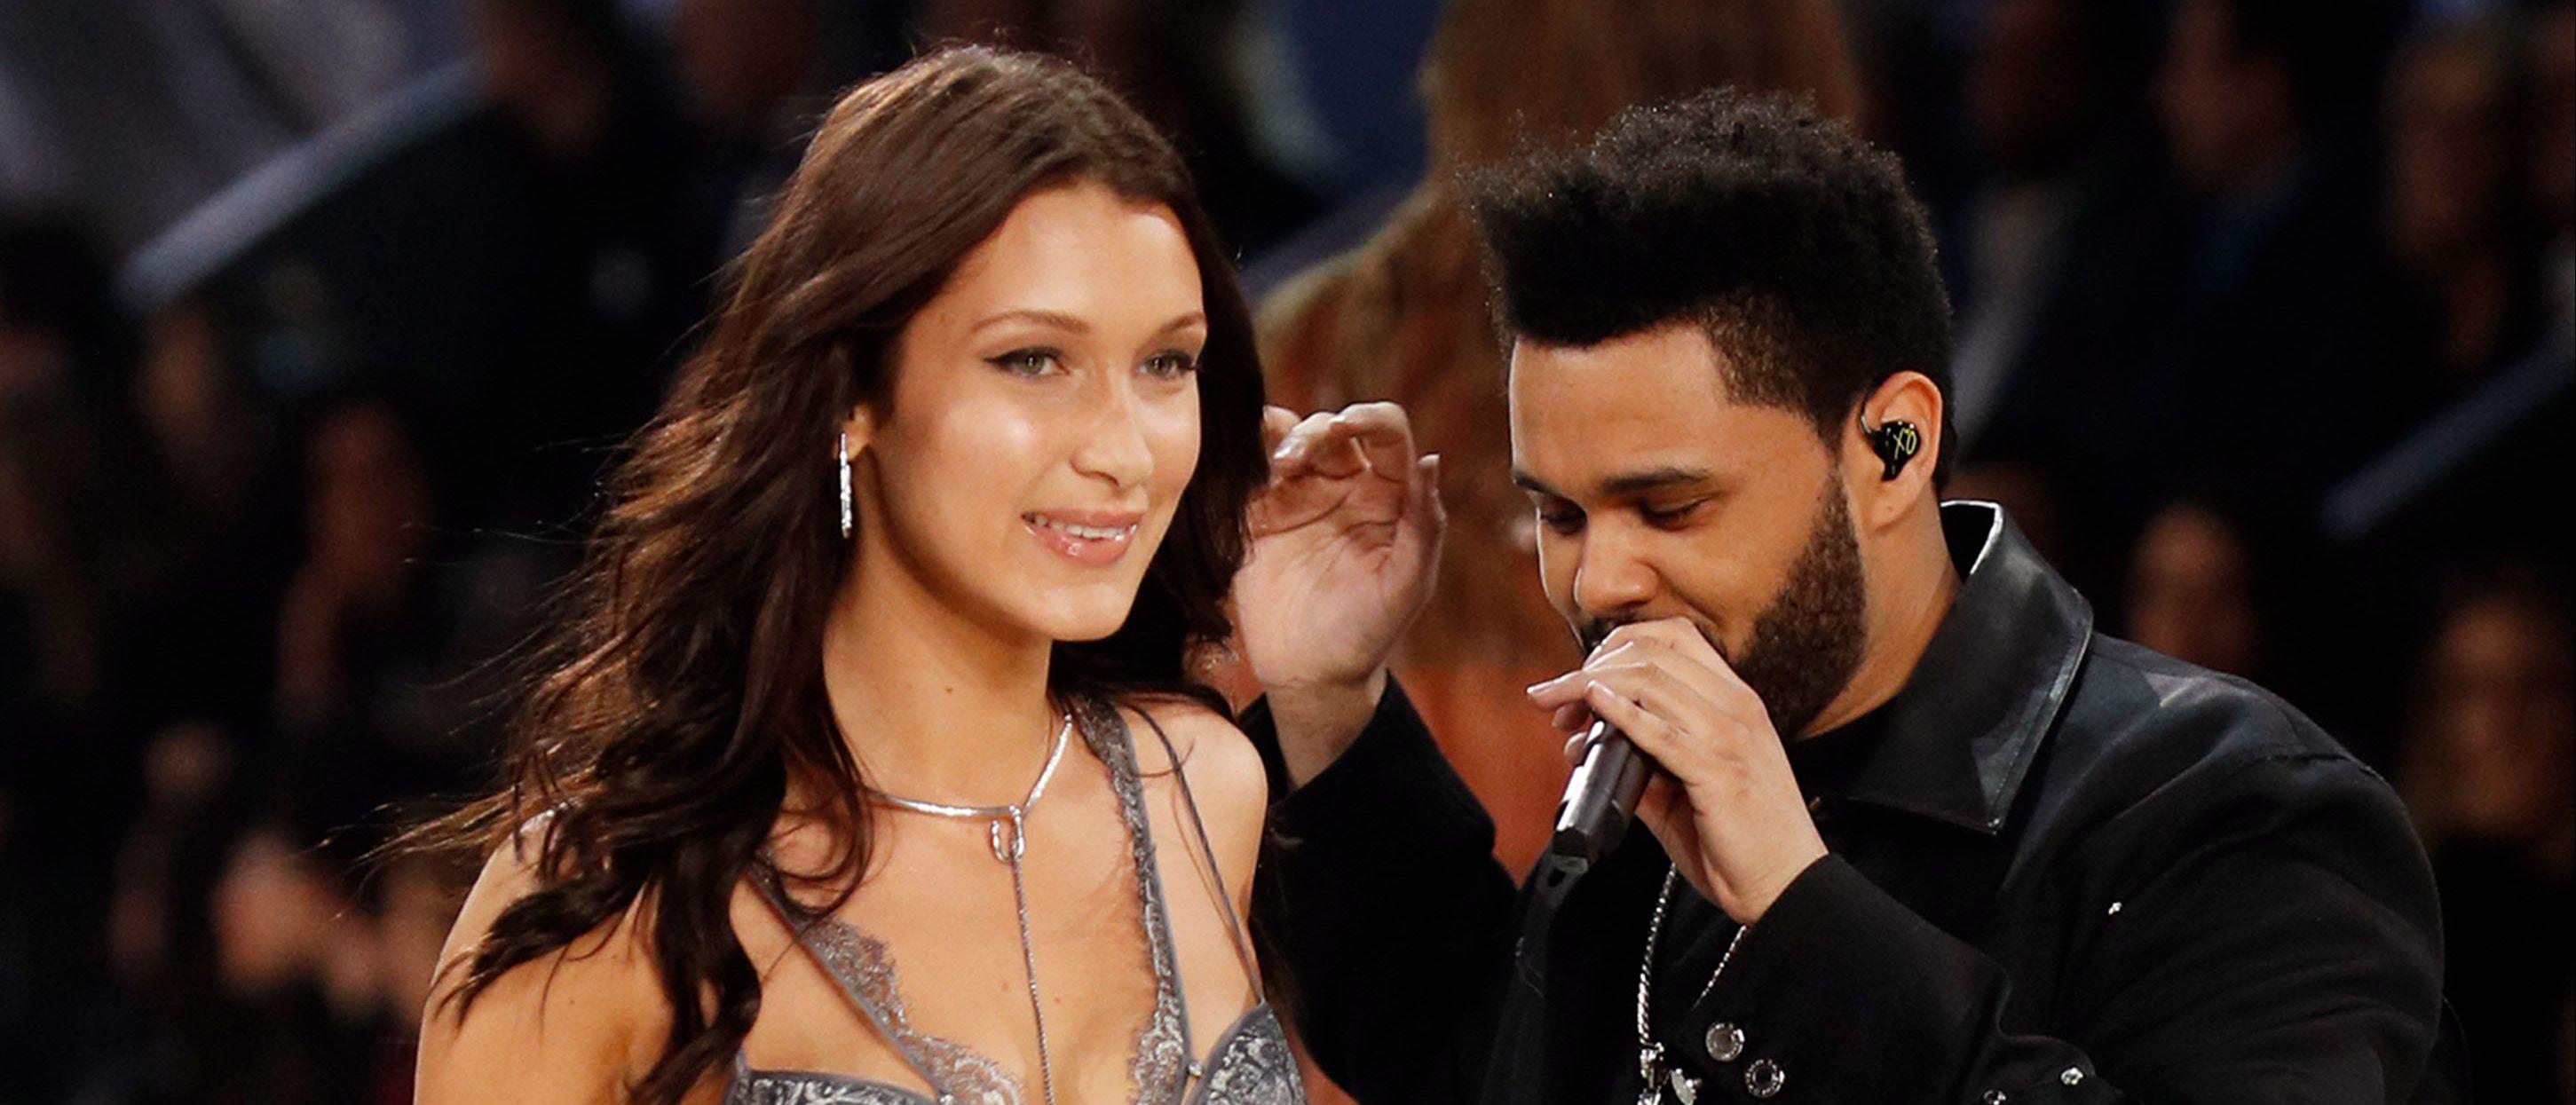 Bella and the Weeknd (Photo credit: Splash News)